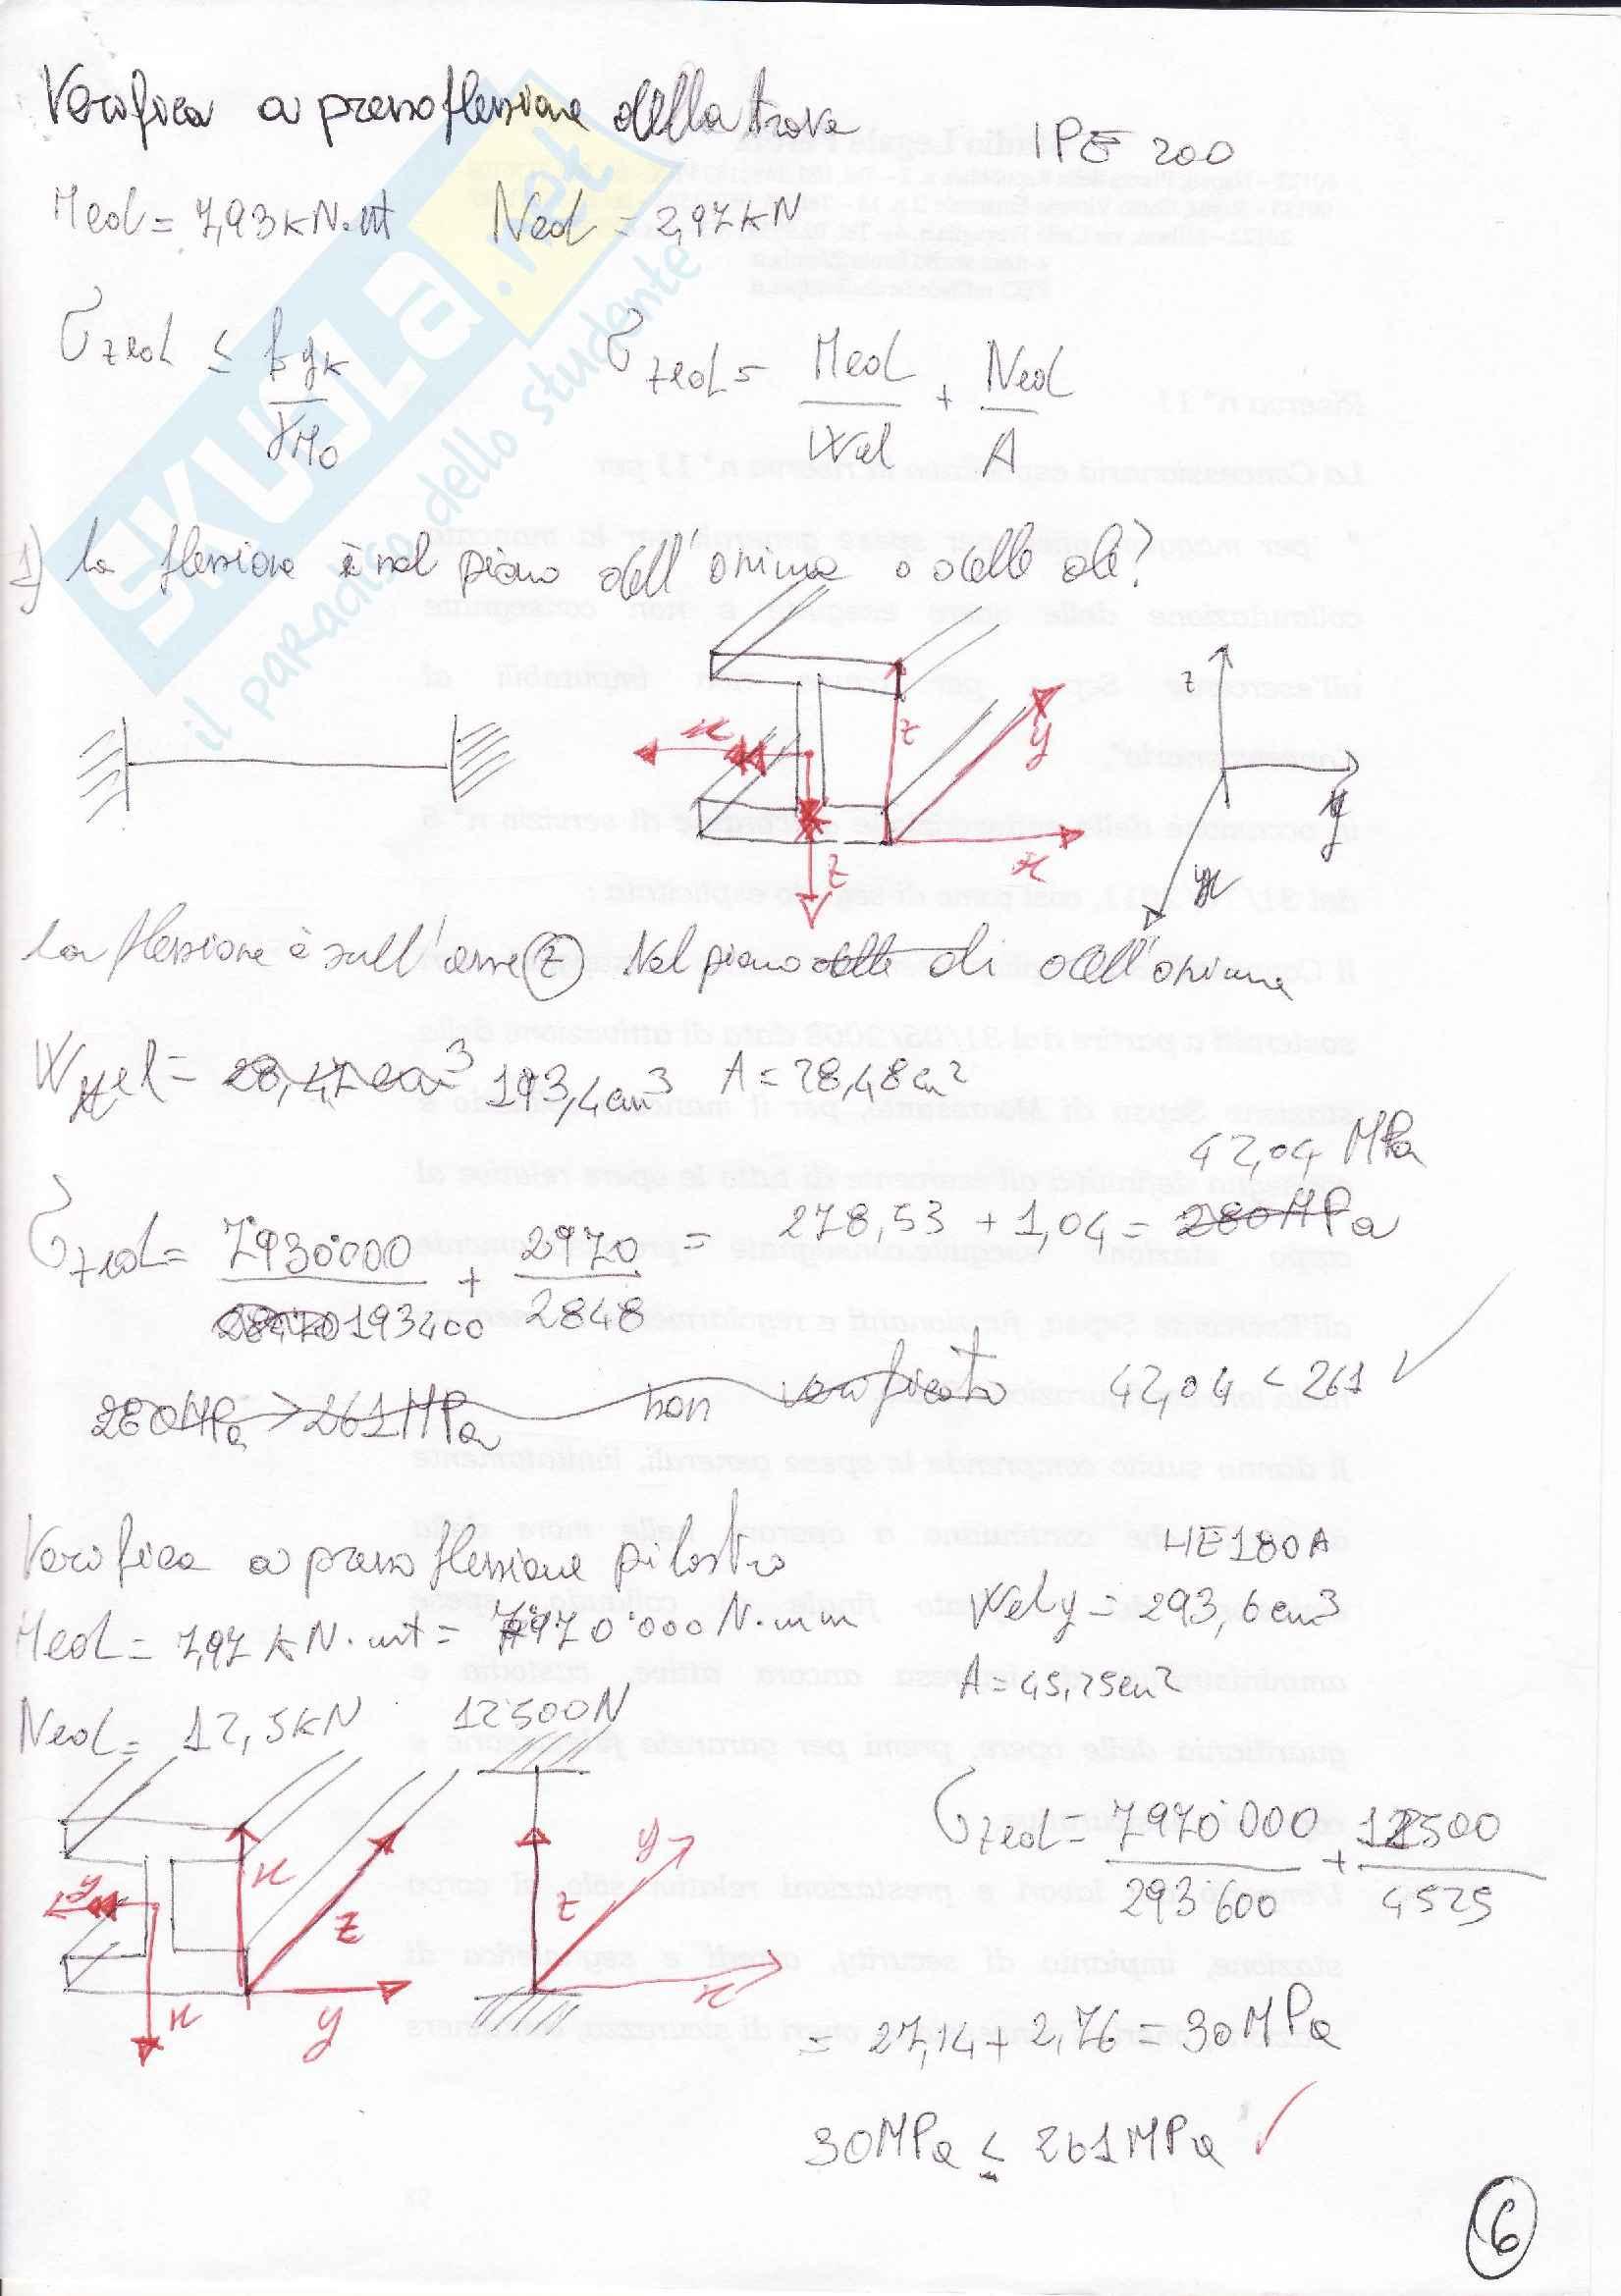 Verifica a pressoflessione di una trave in acciaio: Appunti di Tecnica